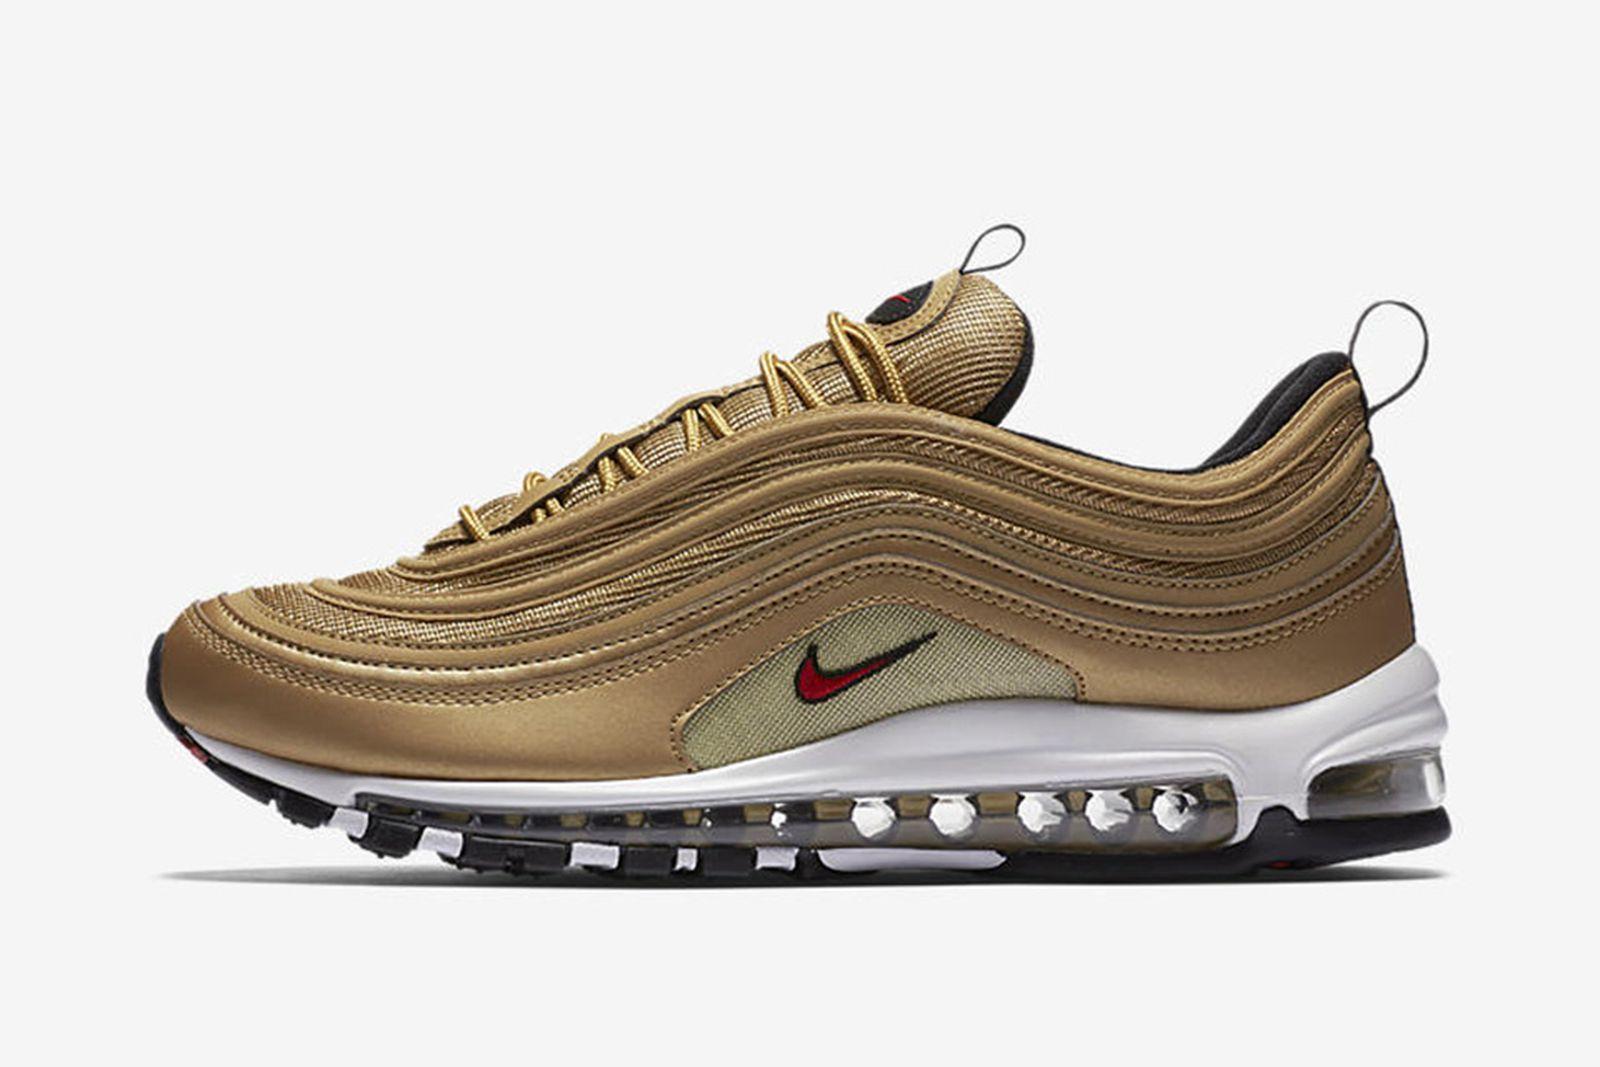 nike-air-vapormax-97-metallic-gold-release-price-03